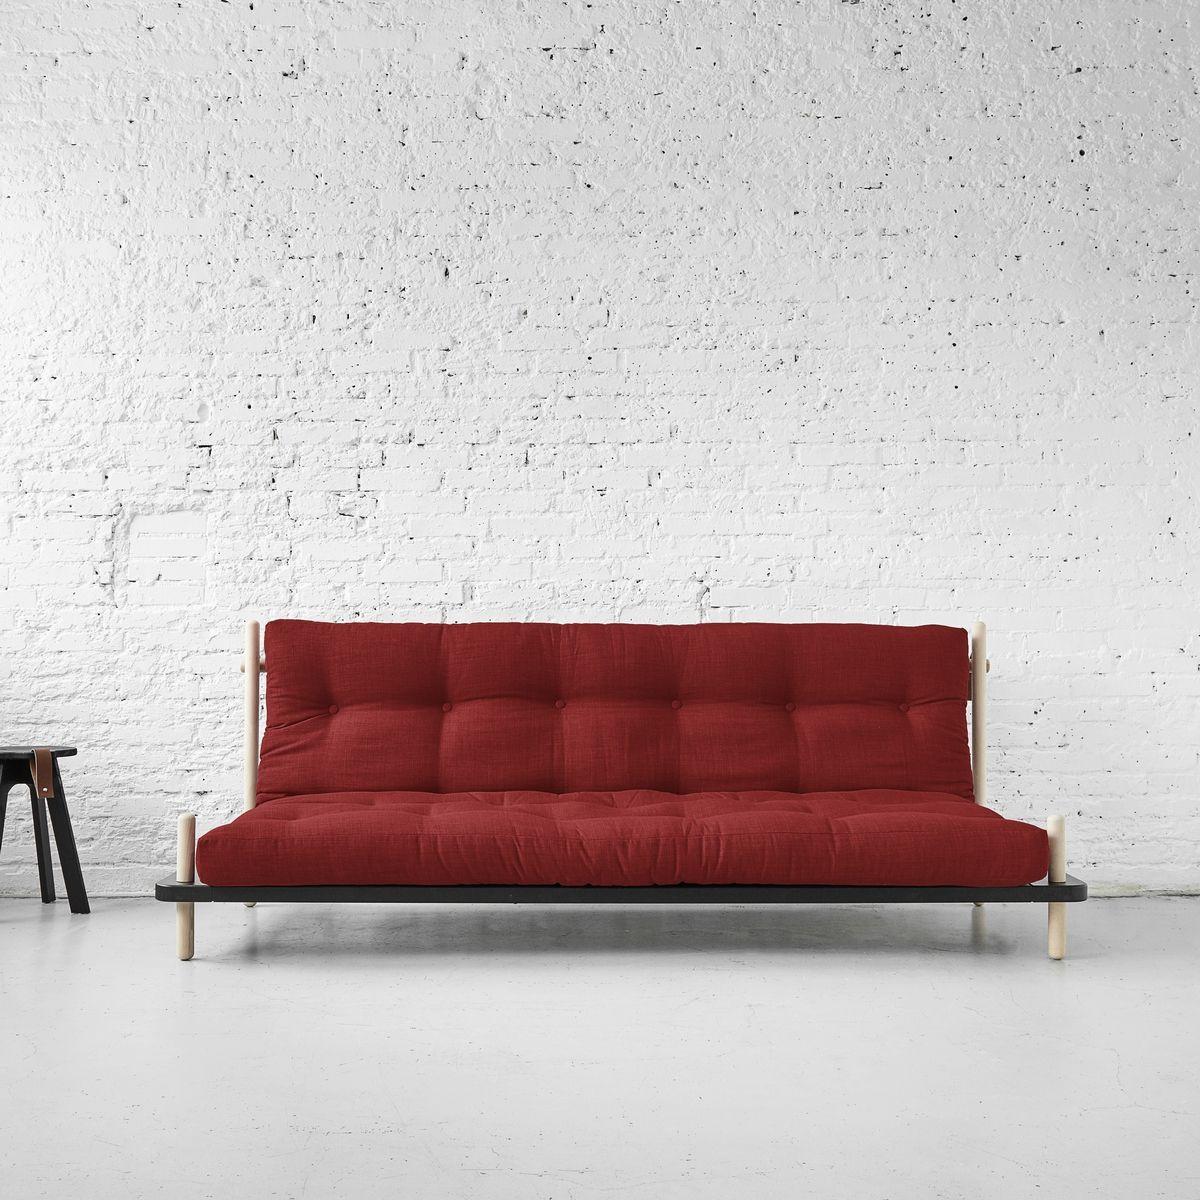 Scandinavian Design Furniture Japanese Design Futon Minimalistic